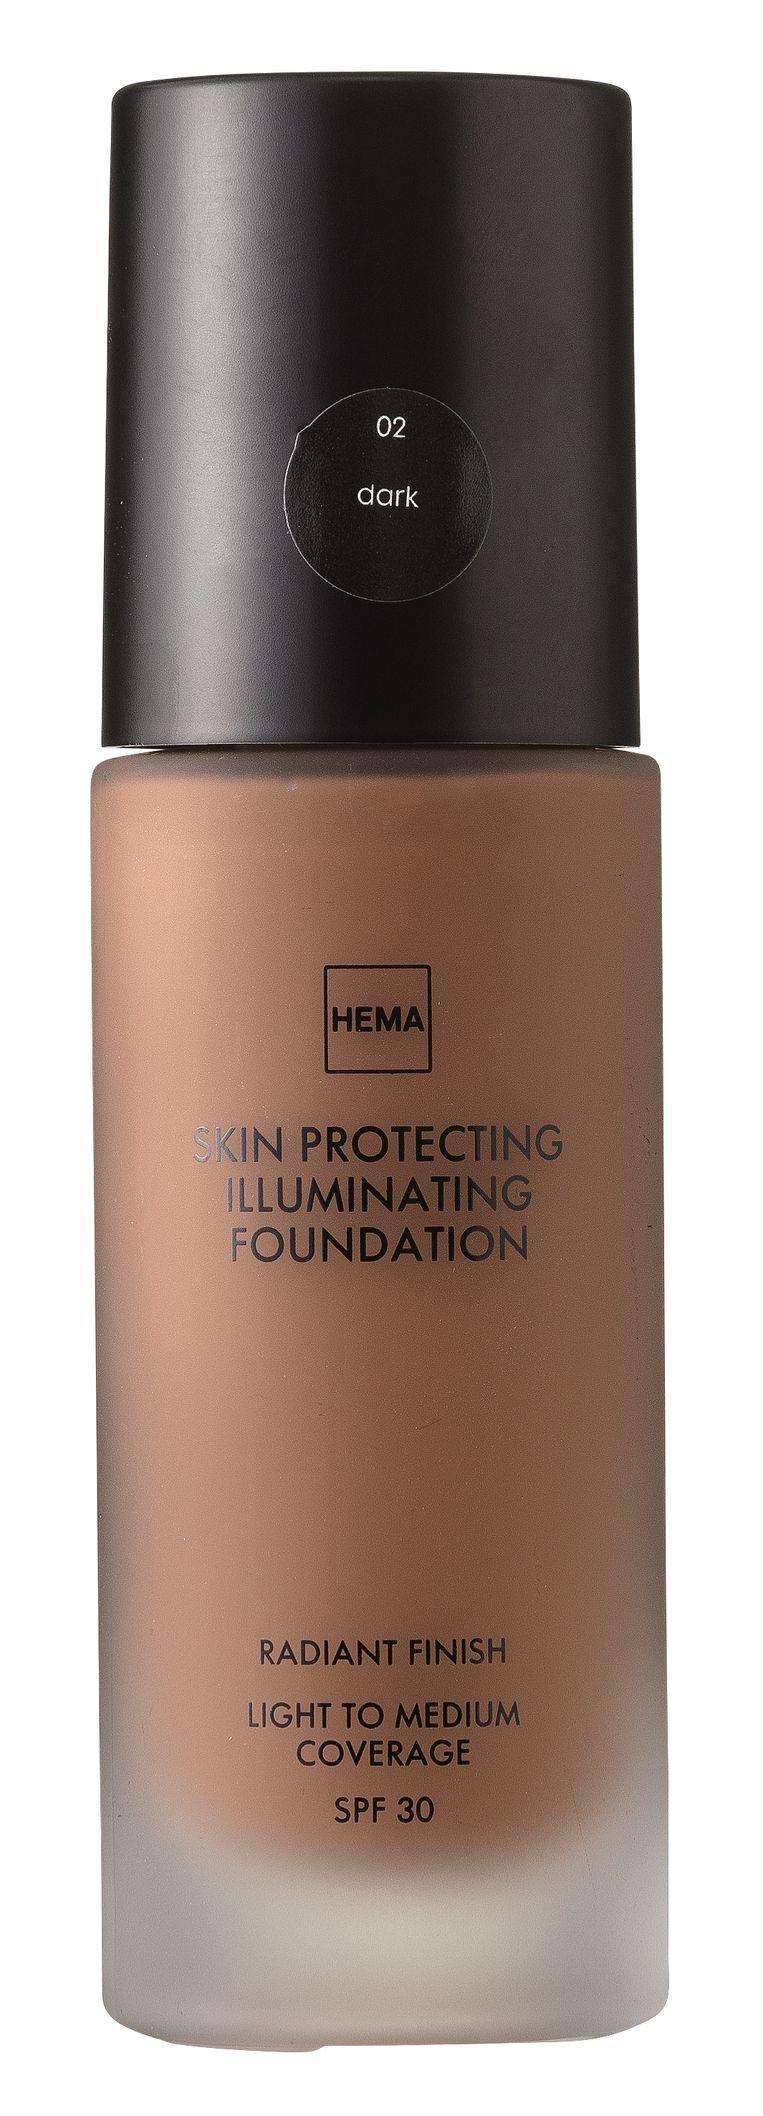 Hema Skin Protecting Illuminating Foundation, in 13 tinten, € 7,50. Beeld null